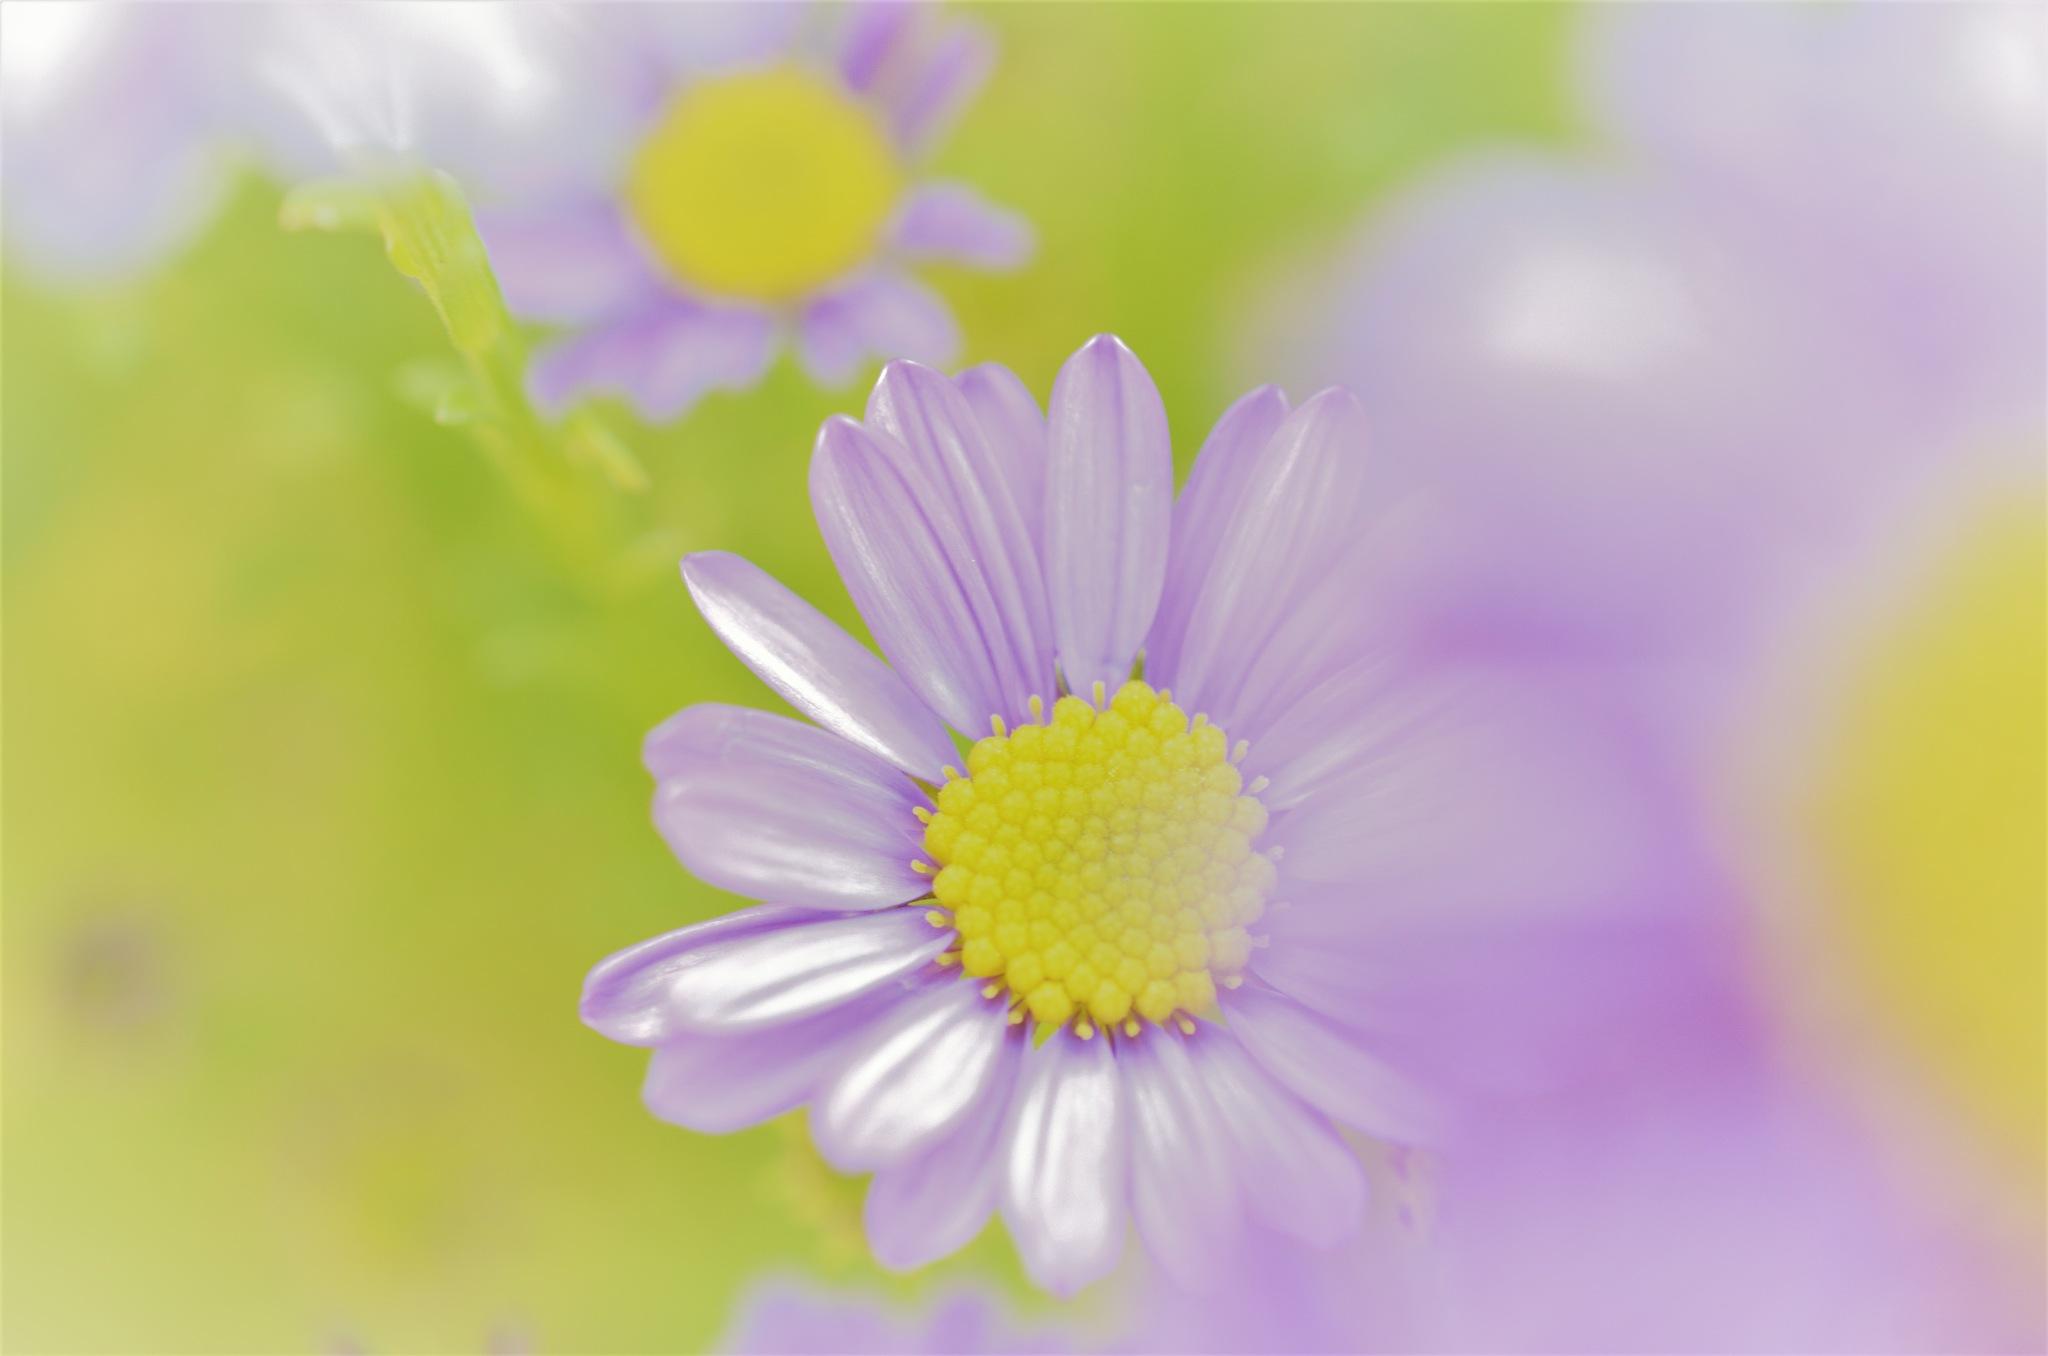 chrysanthemum alternative take by Masahiro  Asano